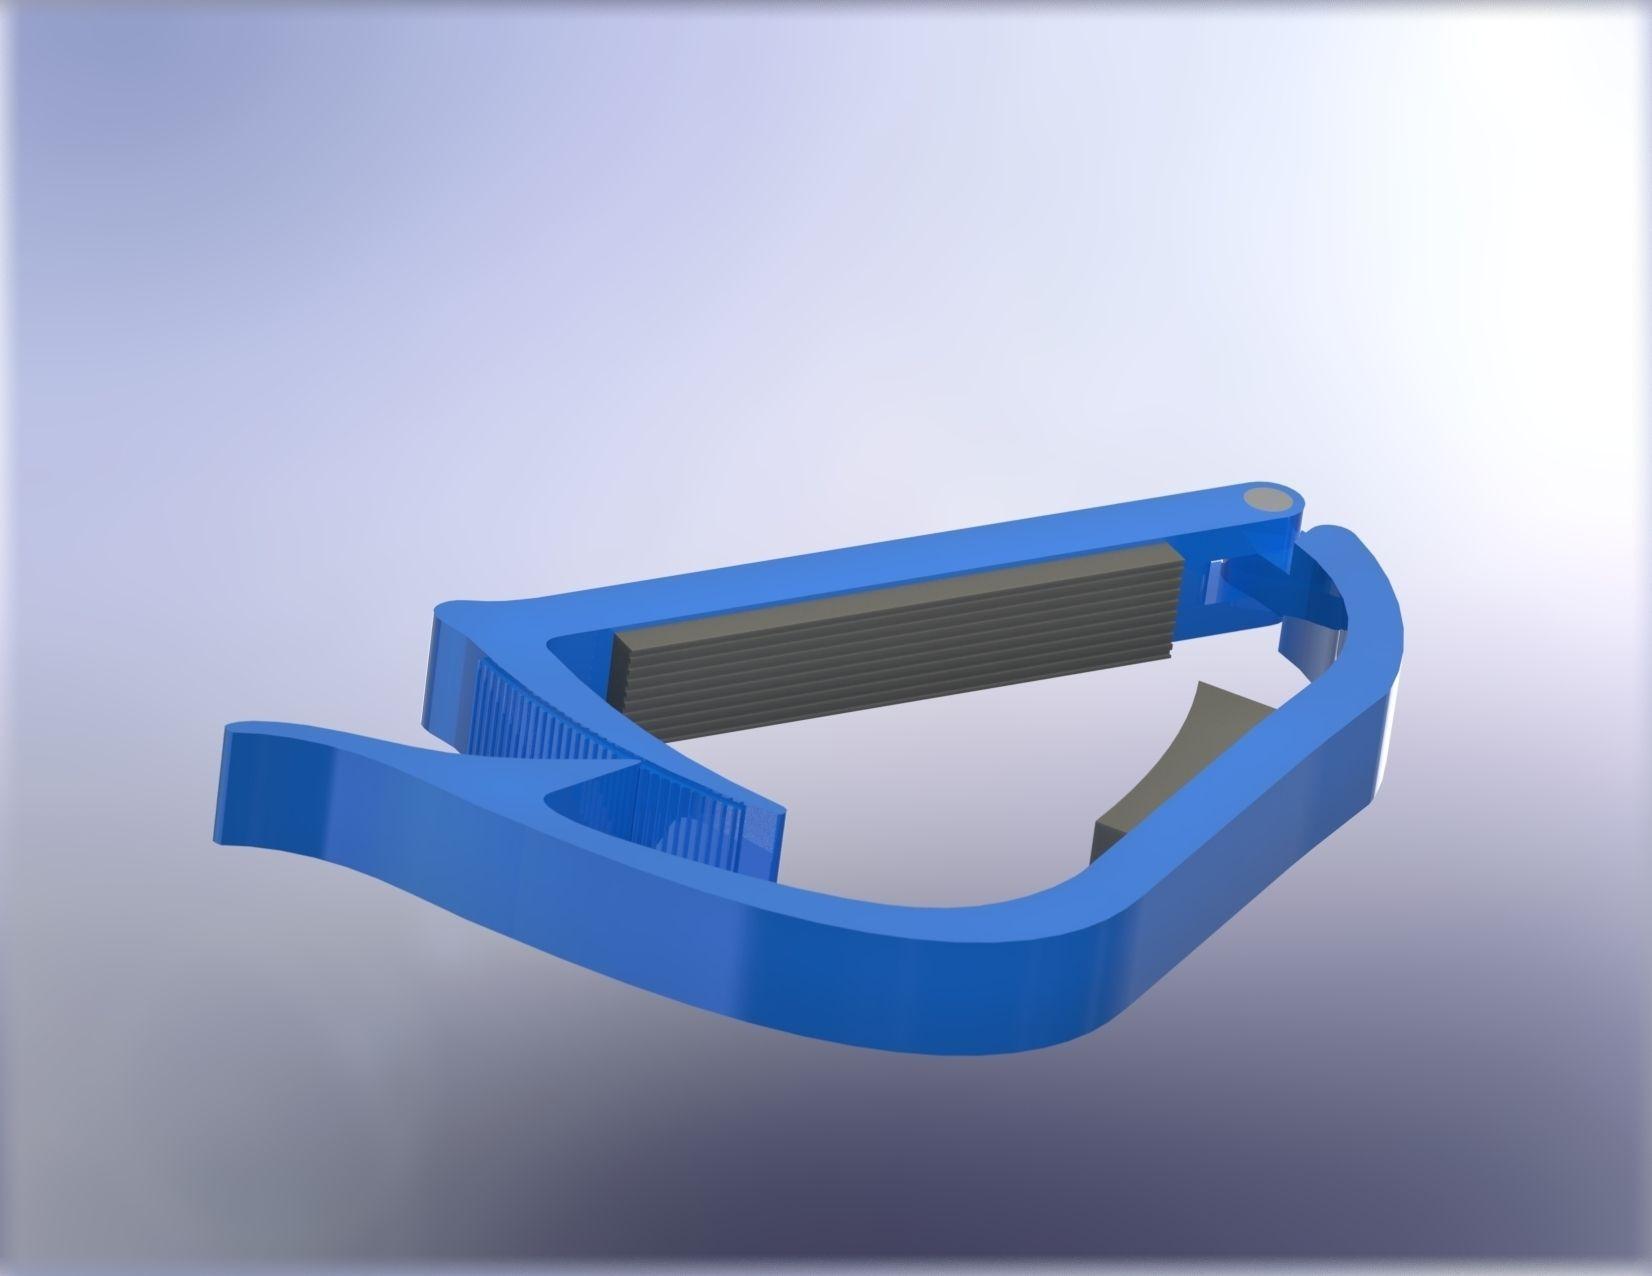 Guitar plastic capo 3D Model 3D printable .max .3ds .ige ...